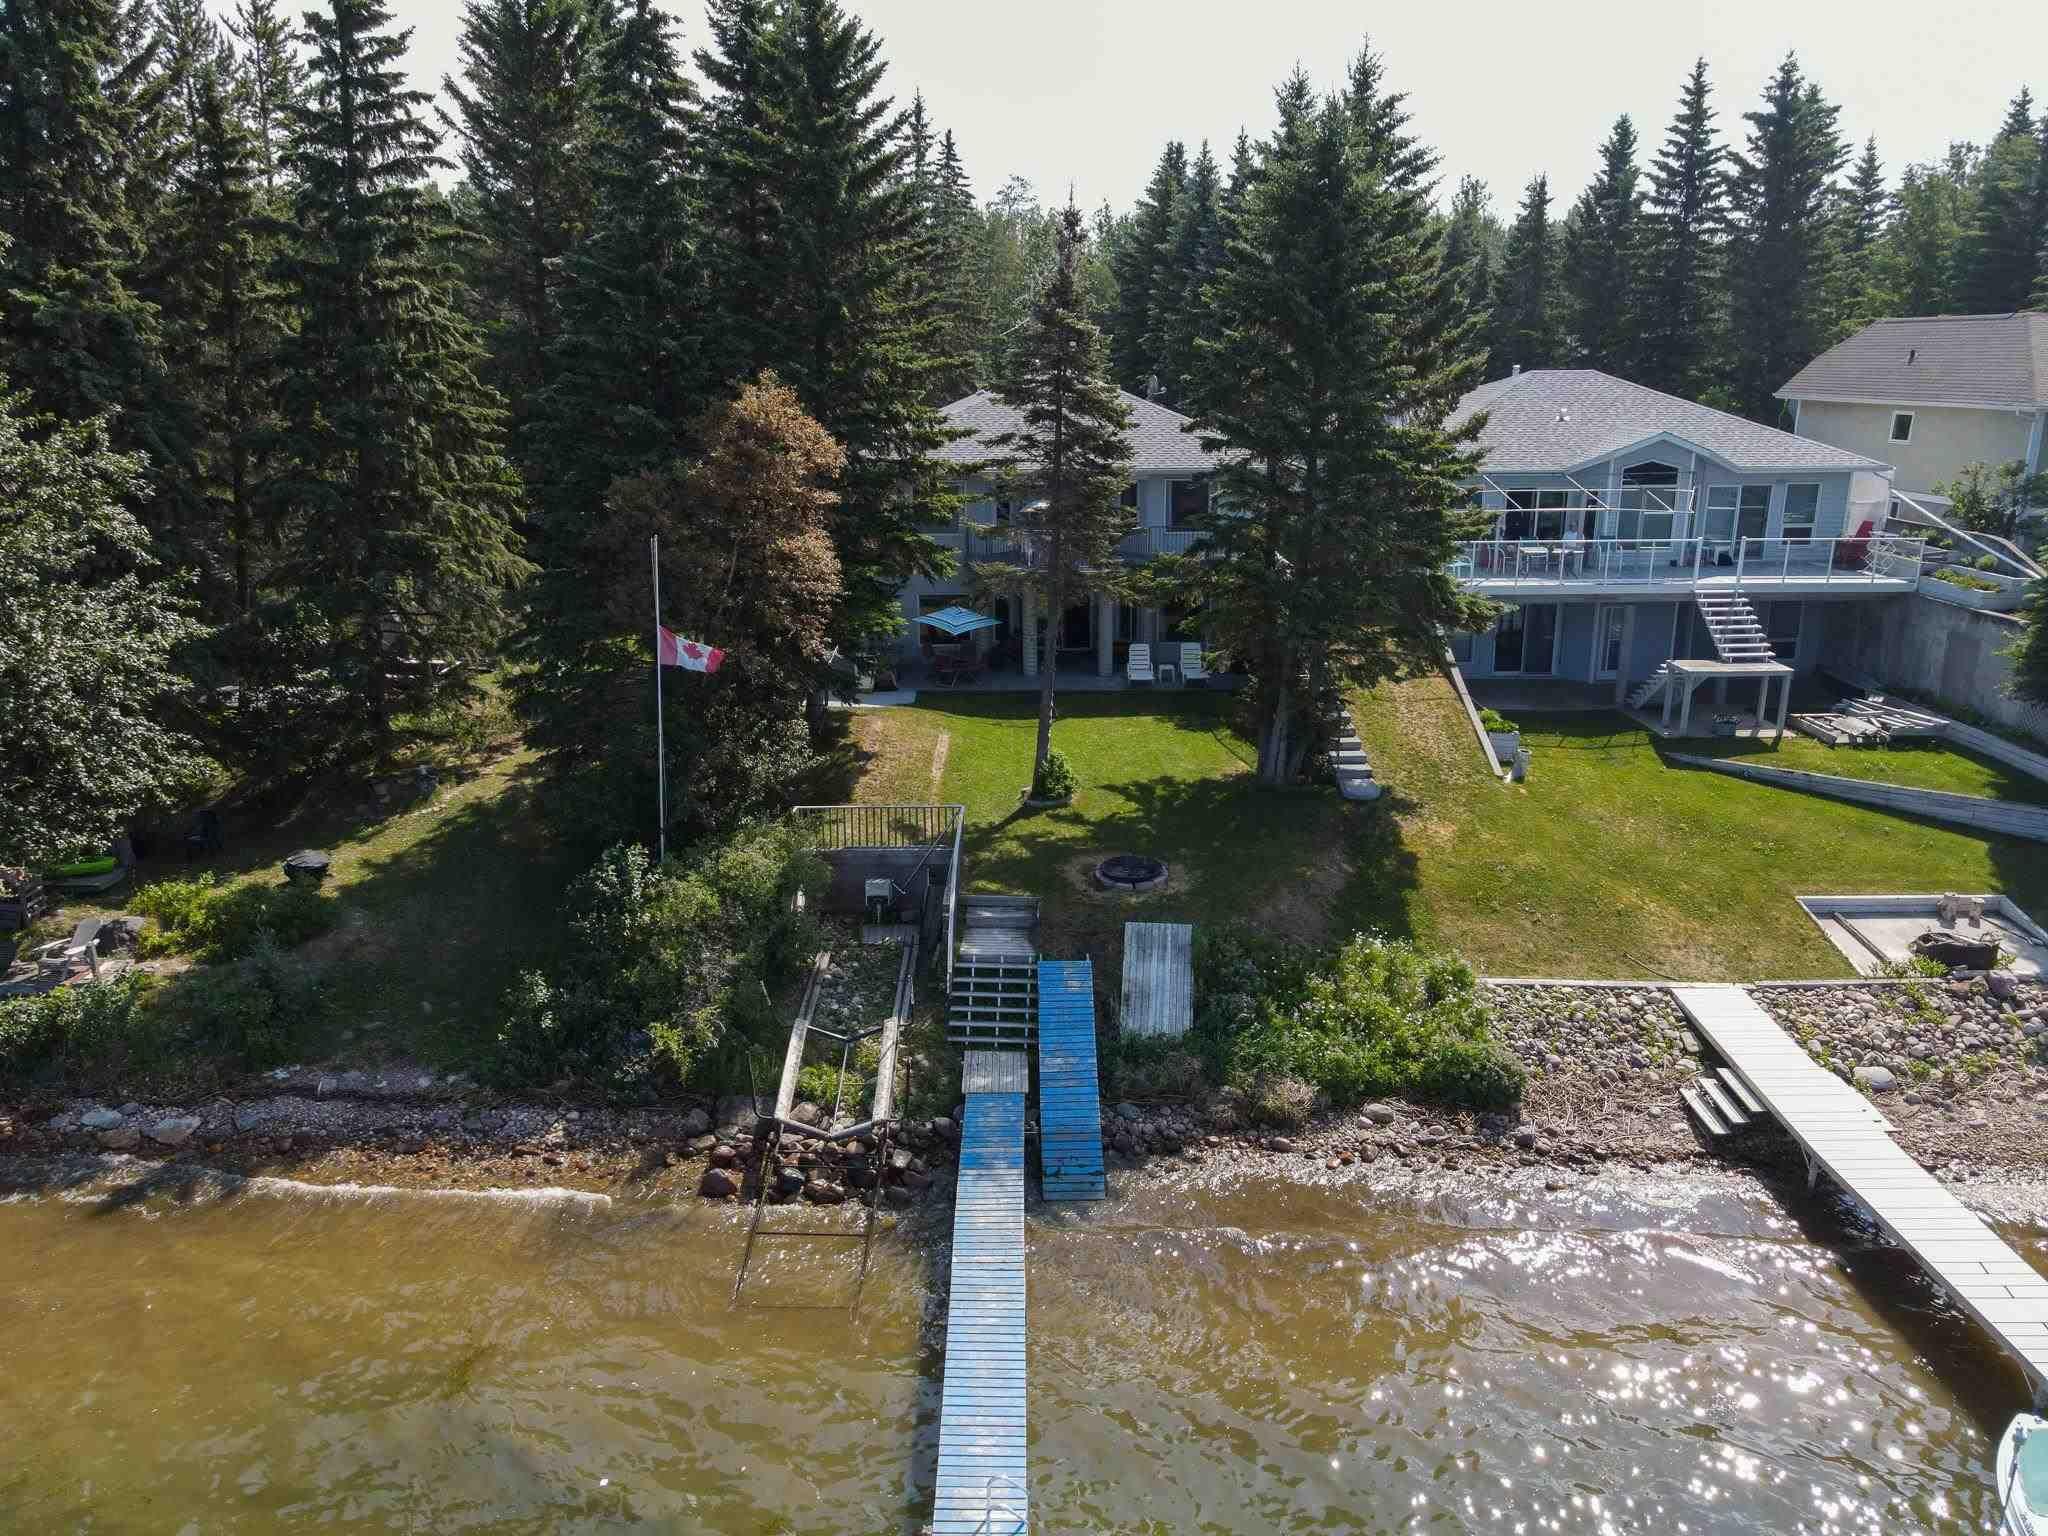 Main Photo: 131 Silver Beach: Rural Wetaskiwin County House for sale : MLS®# E4253948